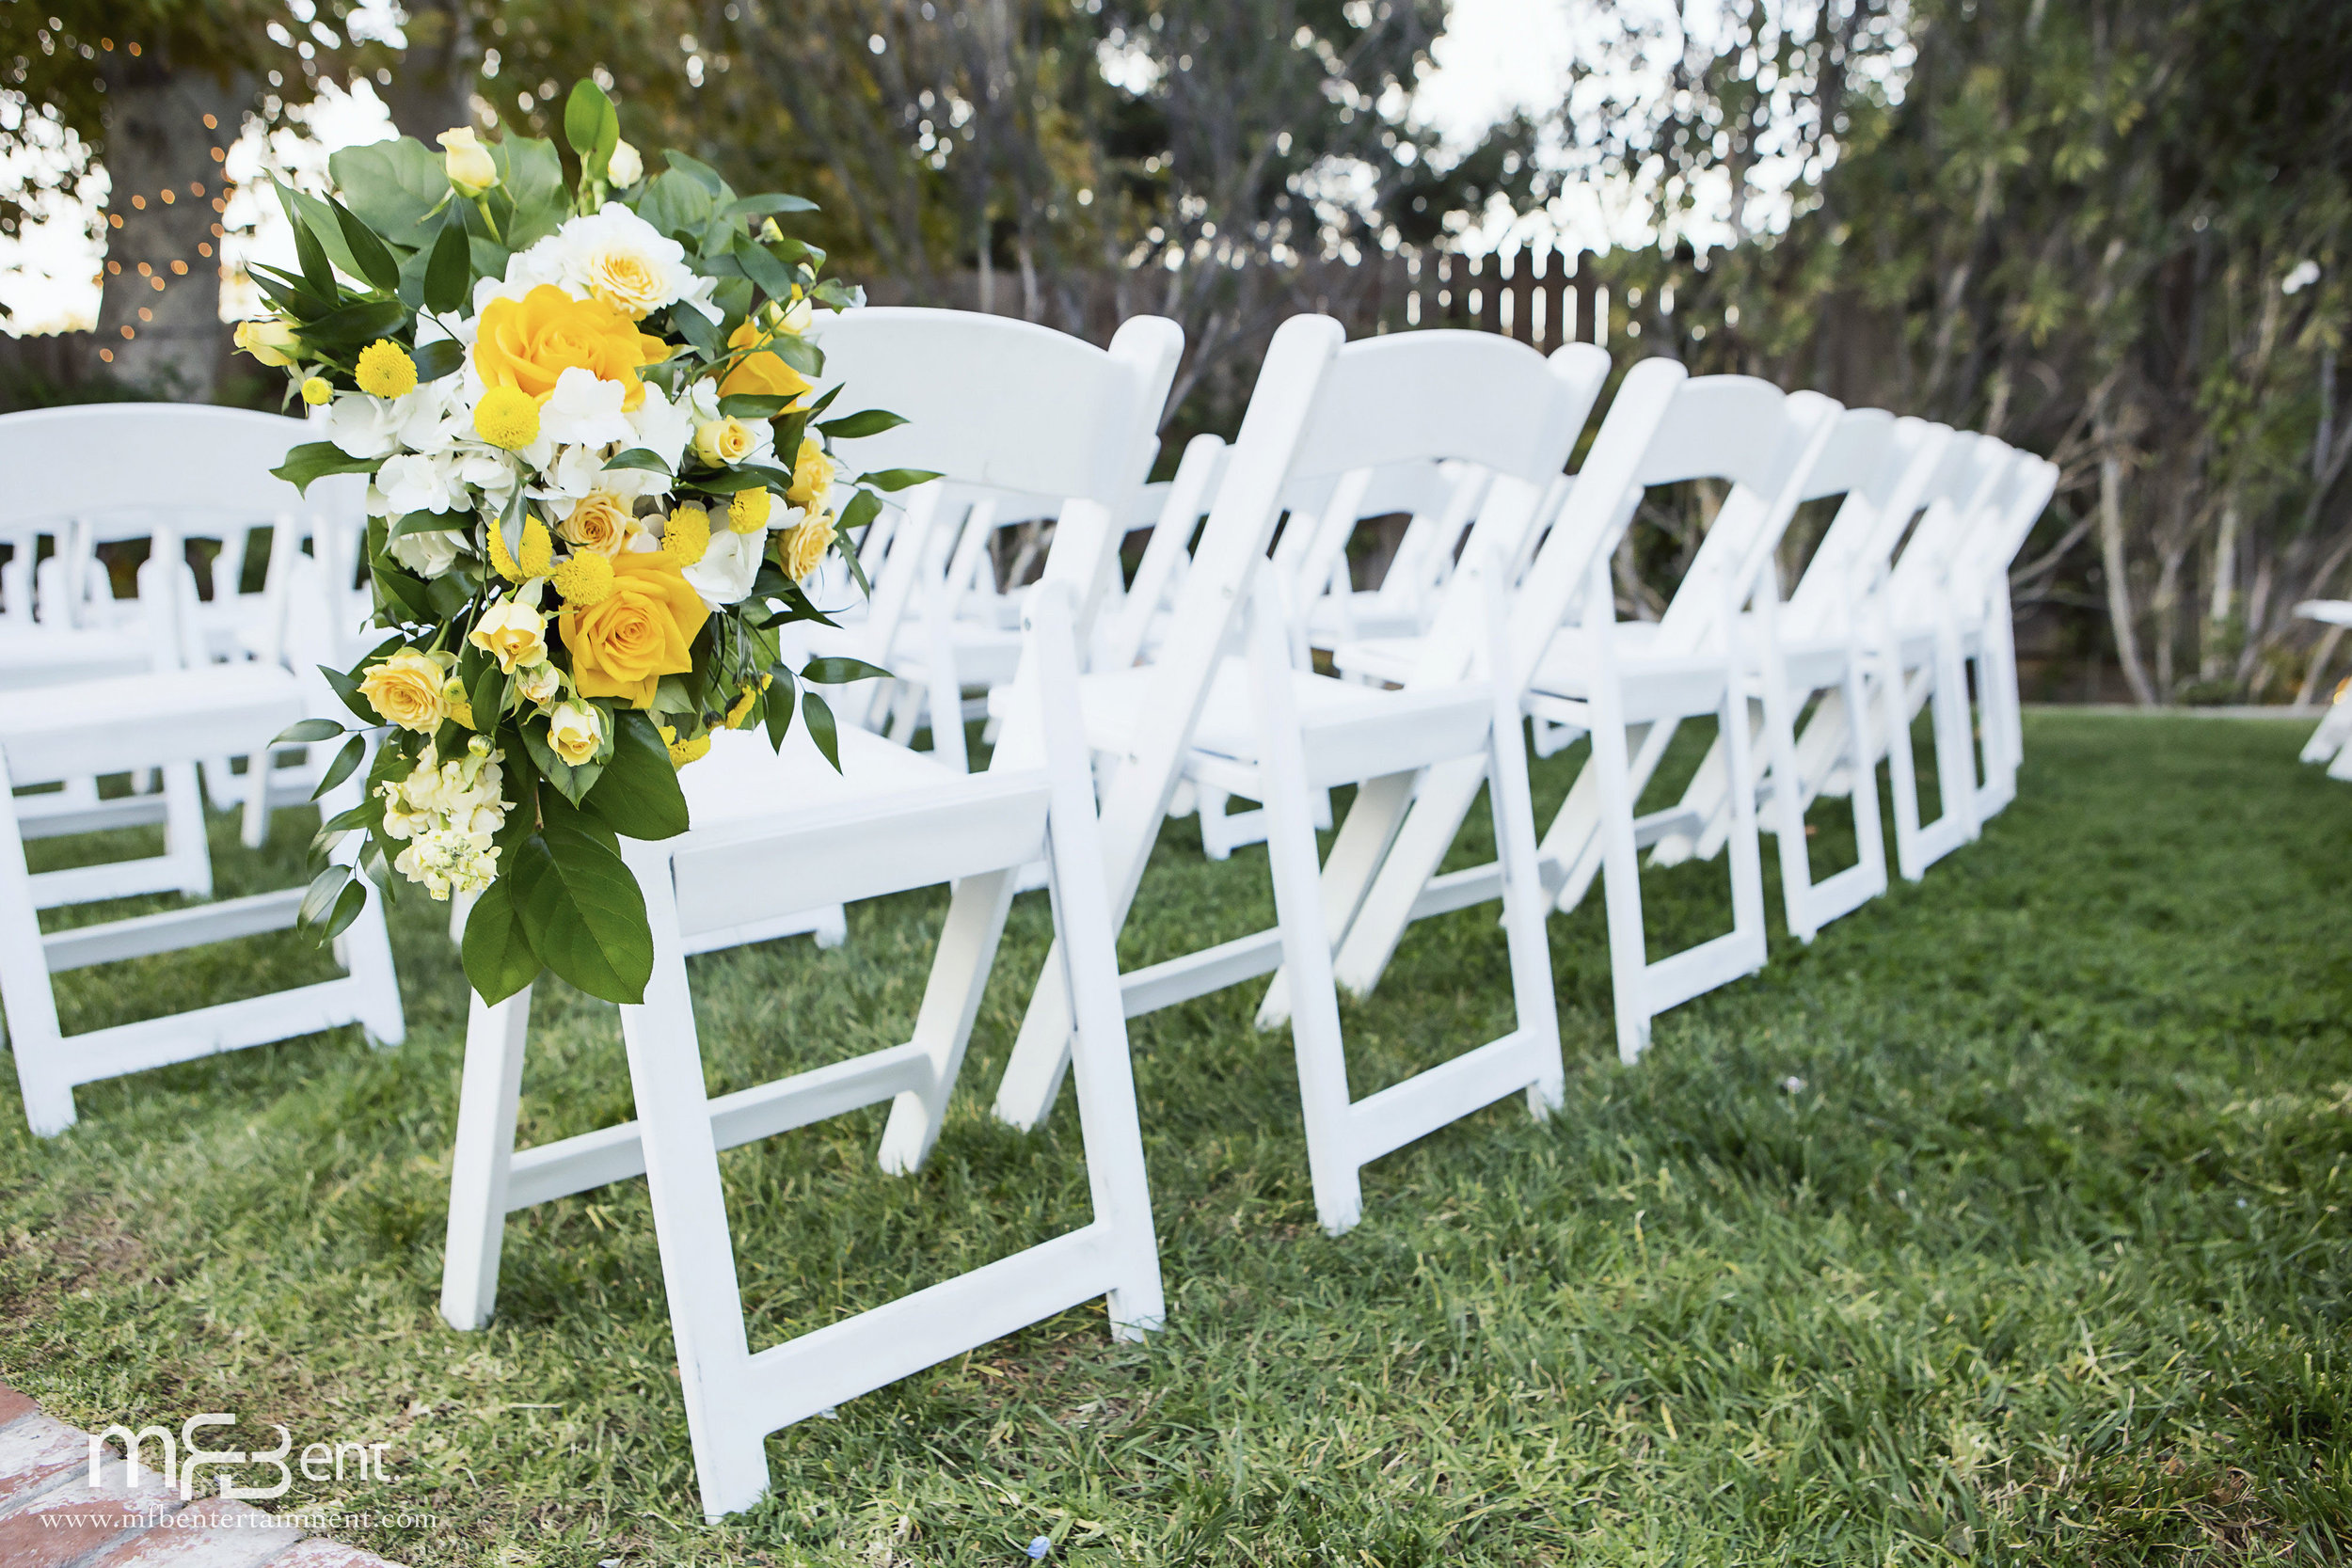 PIOTR CHELSEA WEDDING-CEREMONY-0005 L.jpg